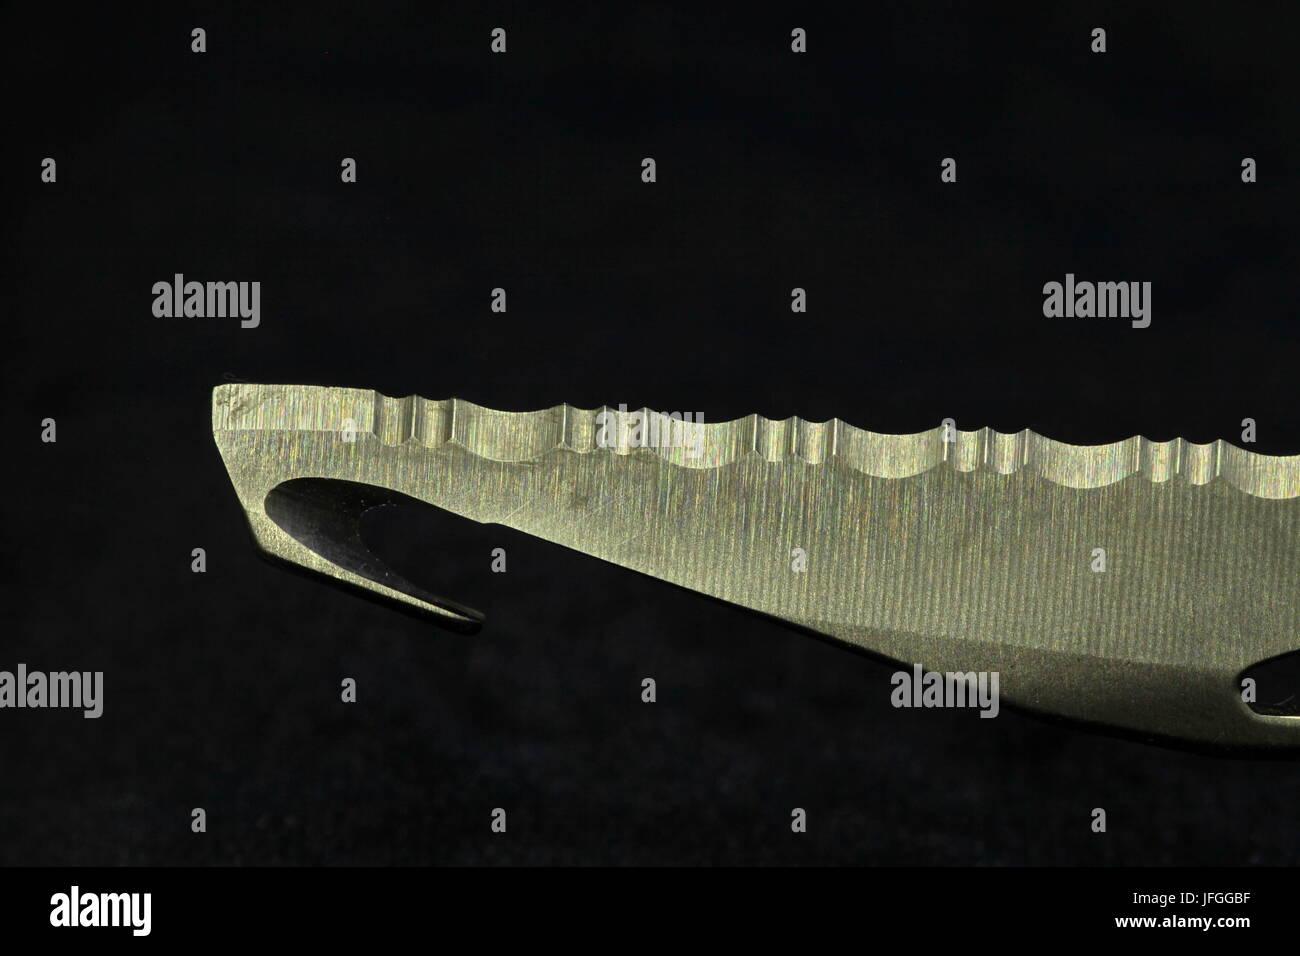 Steel knife Wavy blade - Stock Image